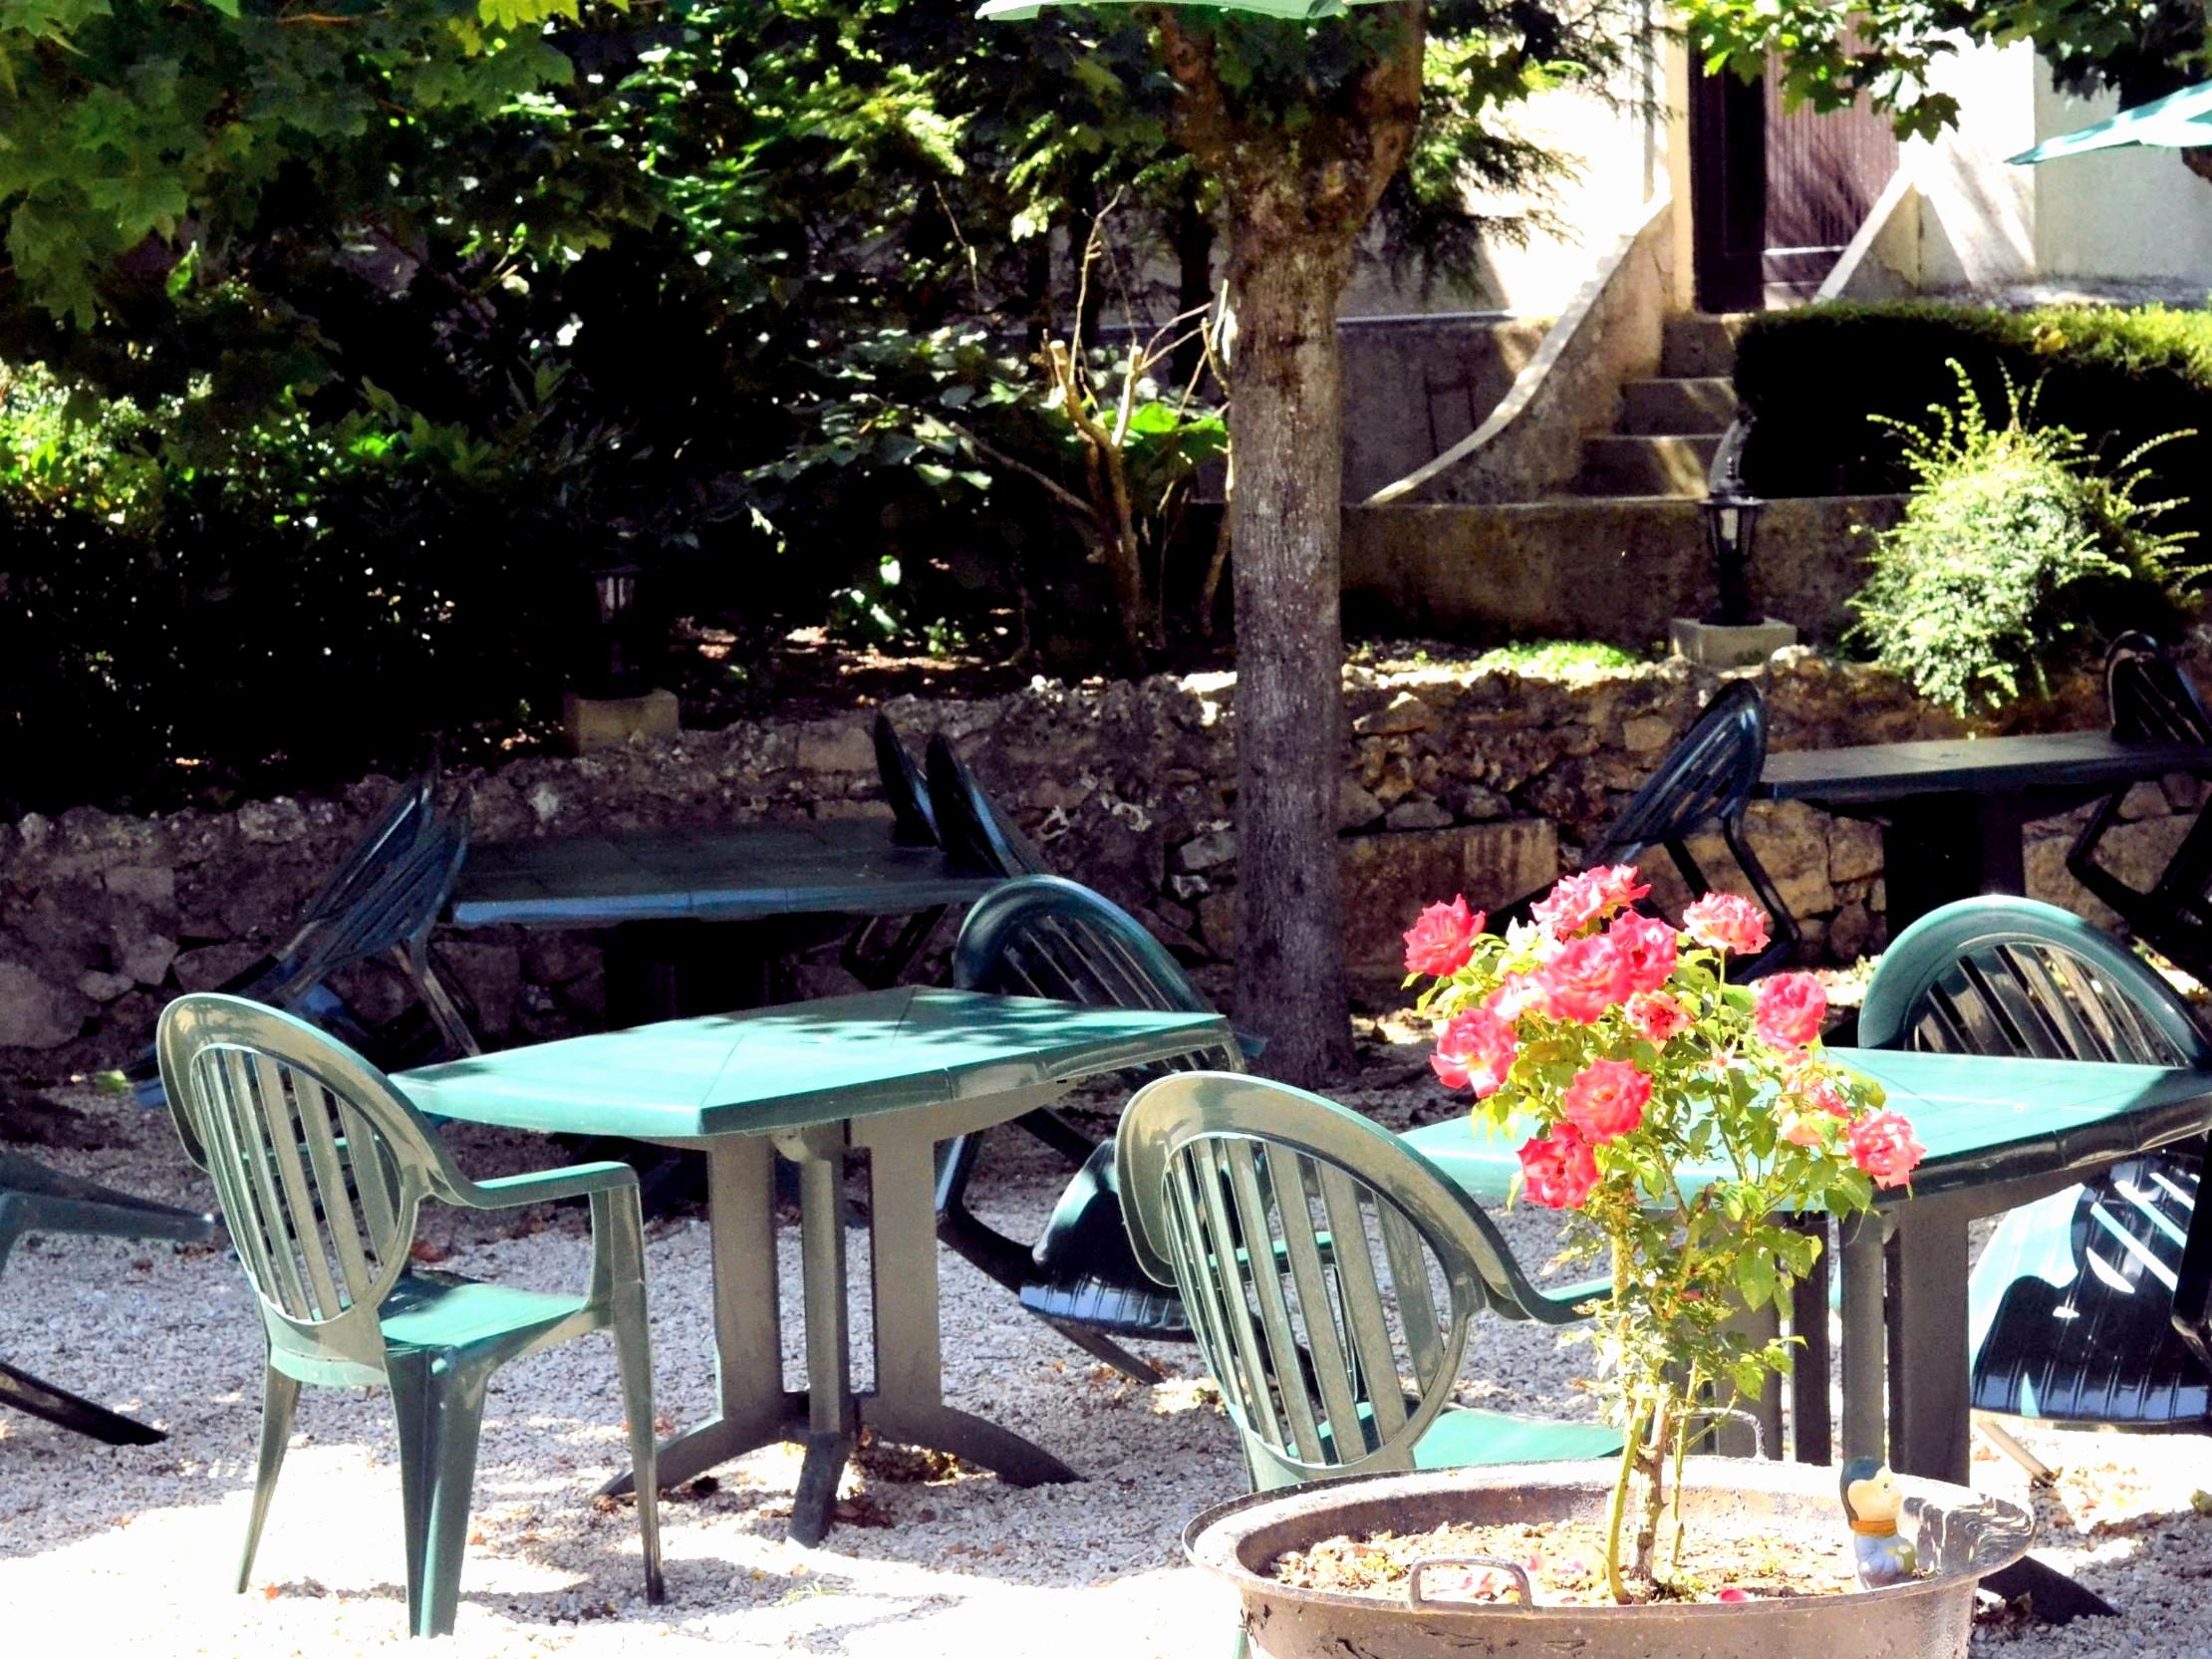 Bordures De Jardin Moderne Inspirant Stock Jardiner Facile Impressionnant Salle De Bain Moderne Au Jardin